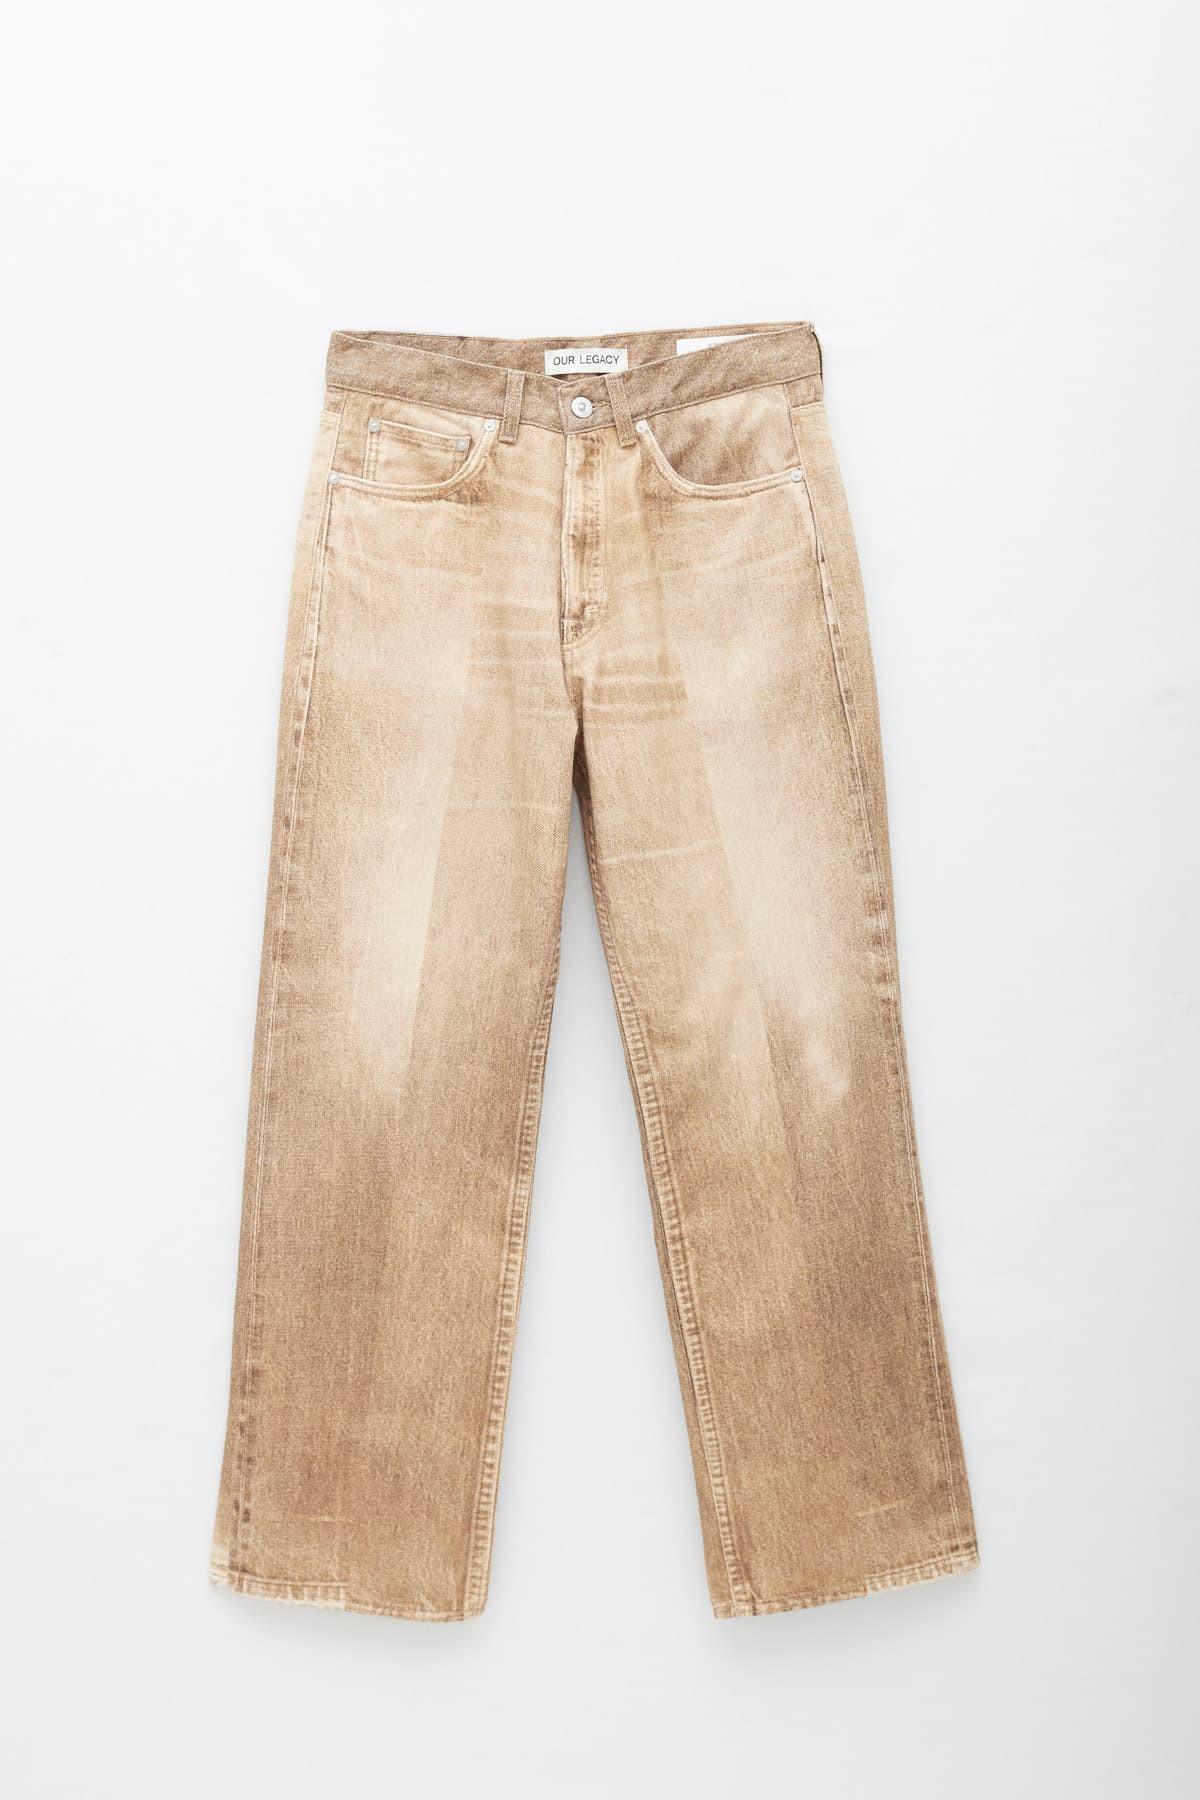 Comprar Telfar Navy Medium Shopper Bag